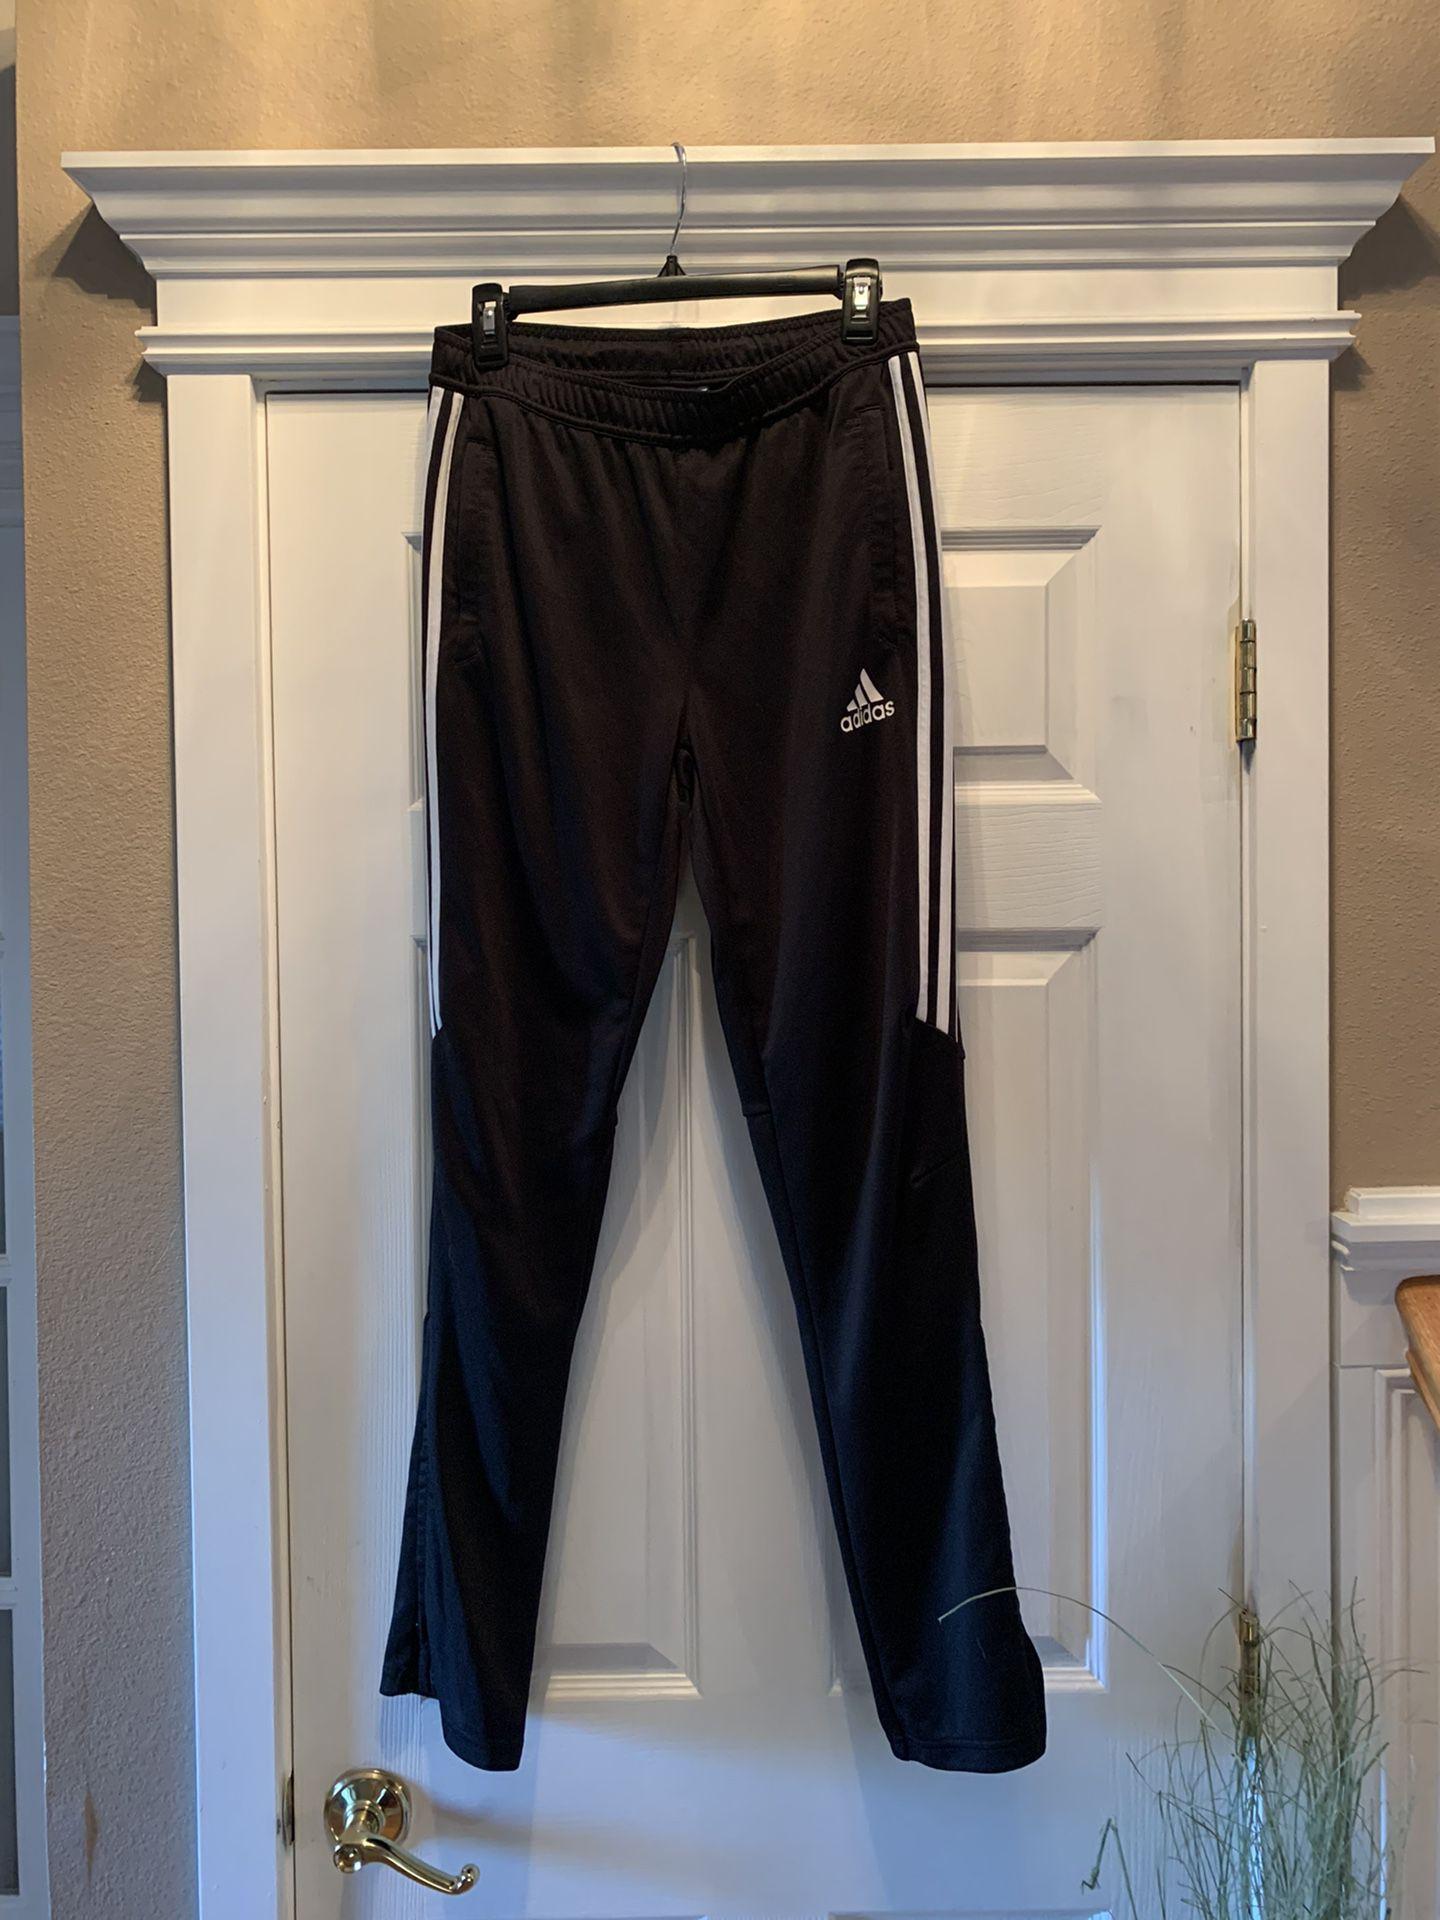 Men's XL Adidas Sweats